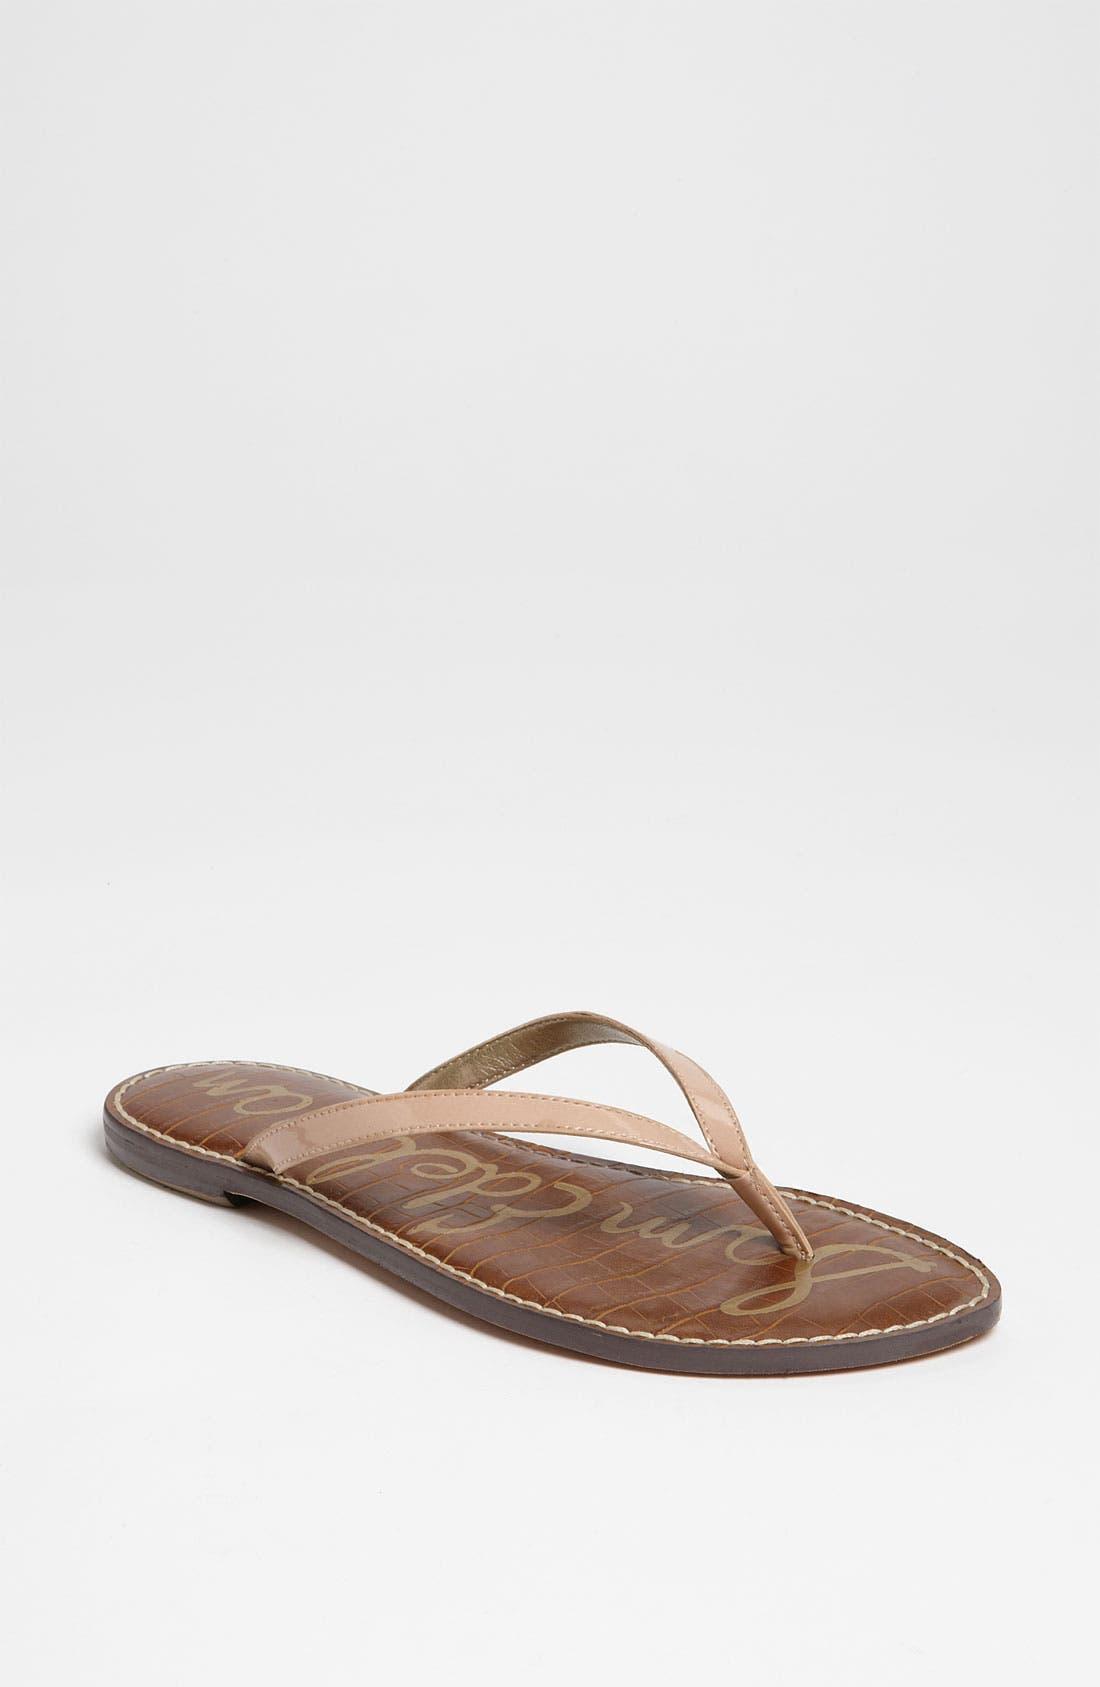 Gracie Sandal,                         Main,                         color, Blush Patent